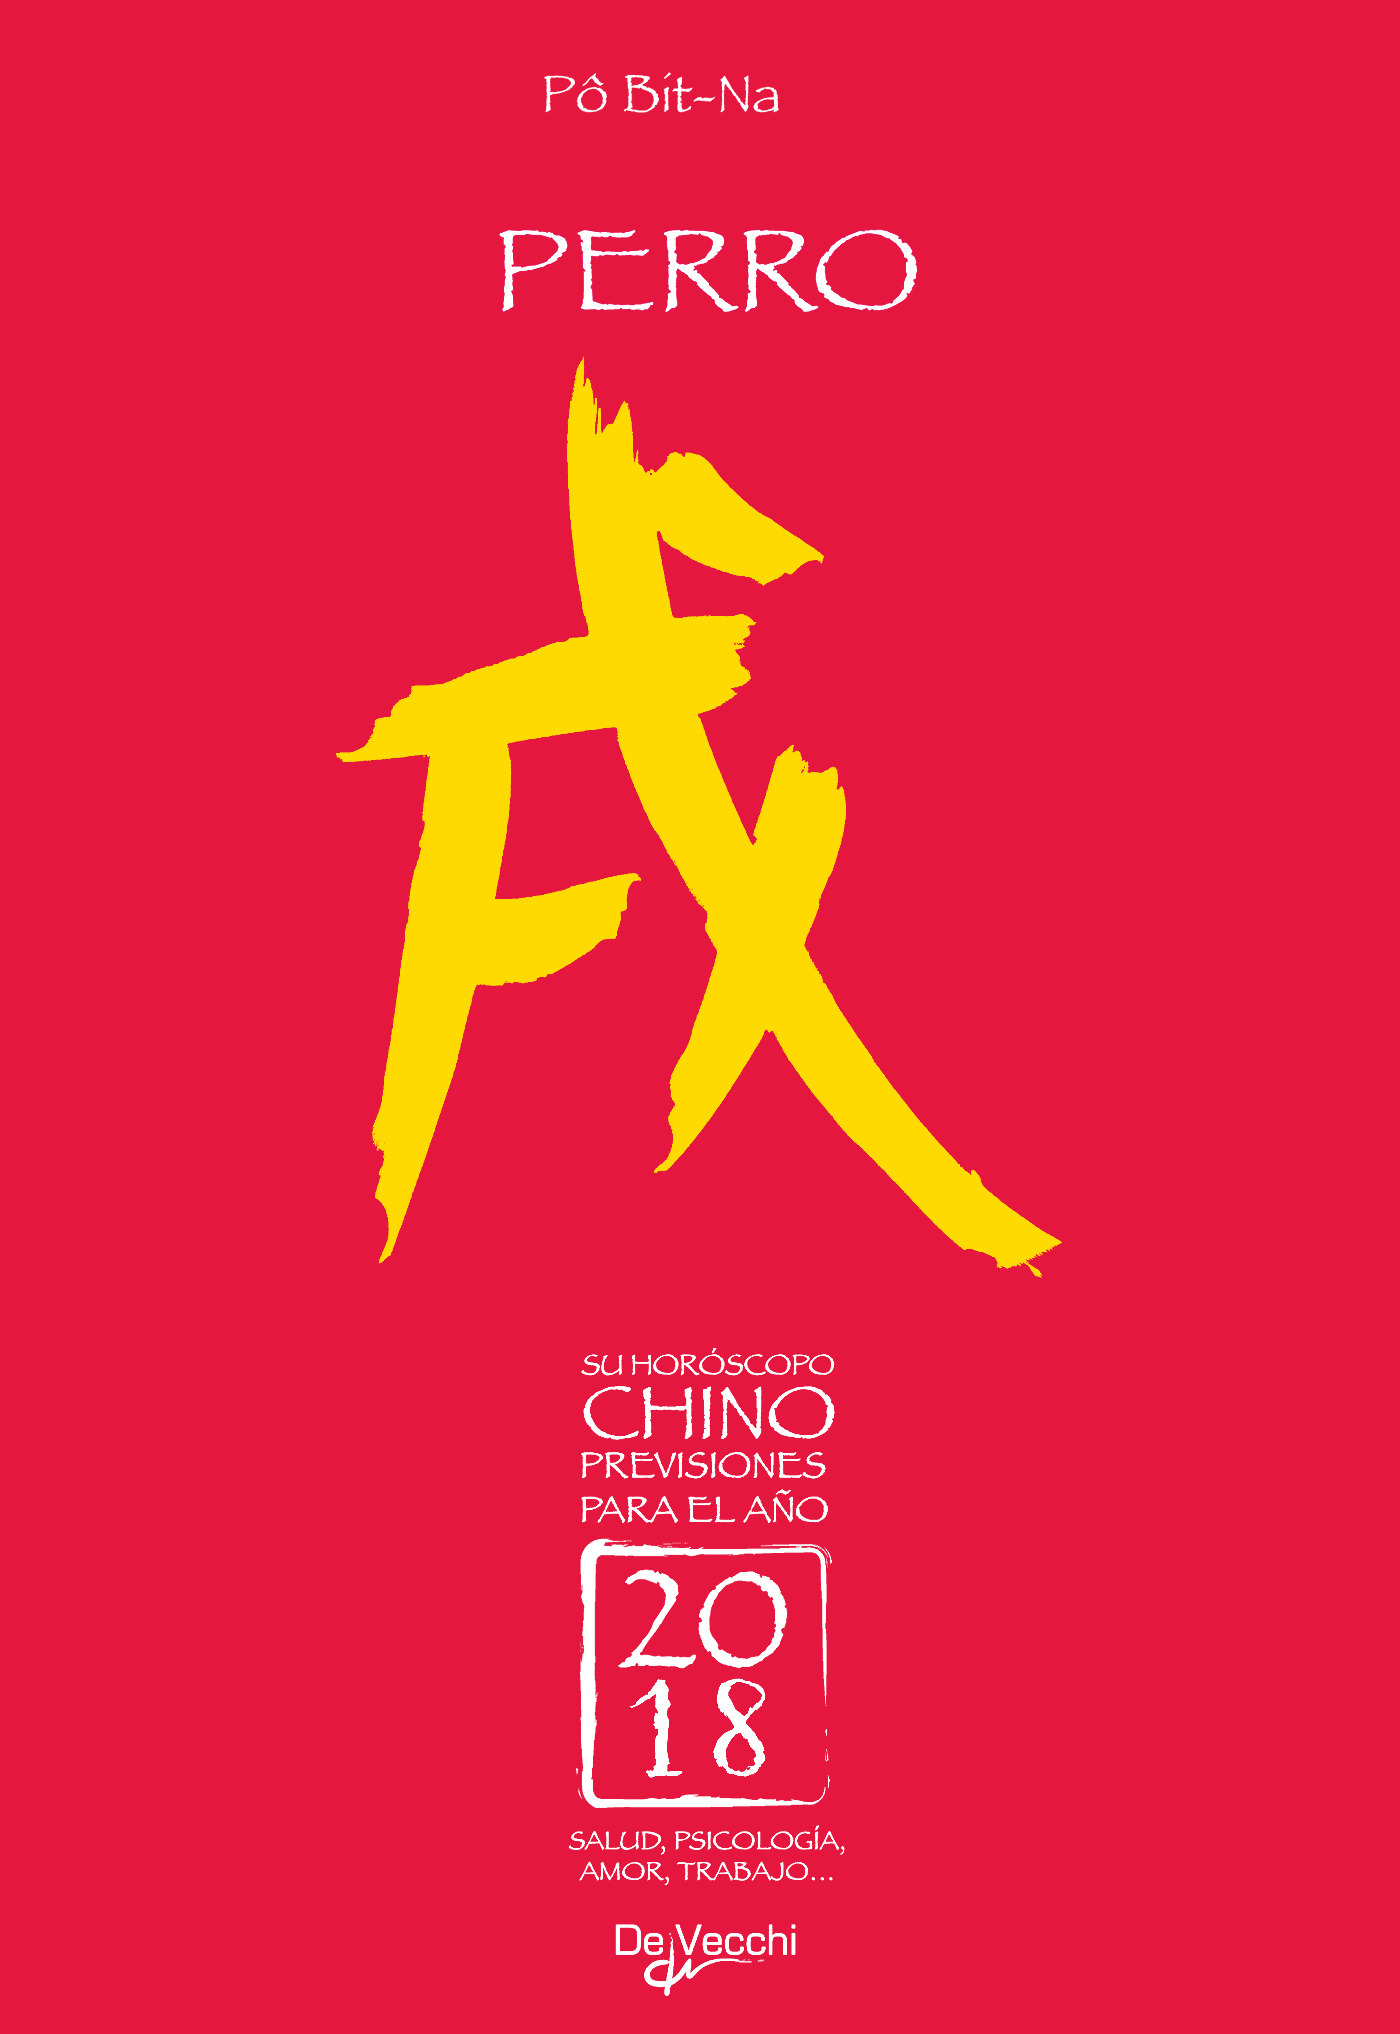 Bit-Na, Pô - Su horóscopo chino. Perro, ebook